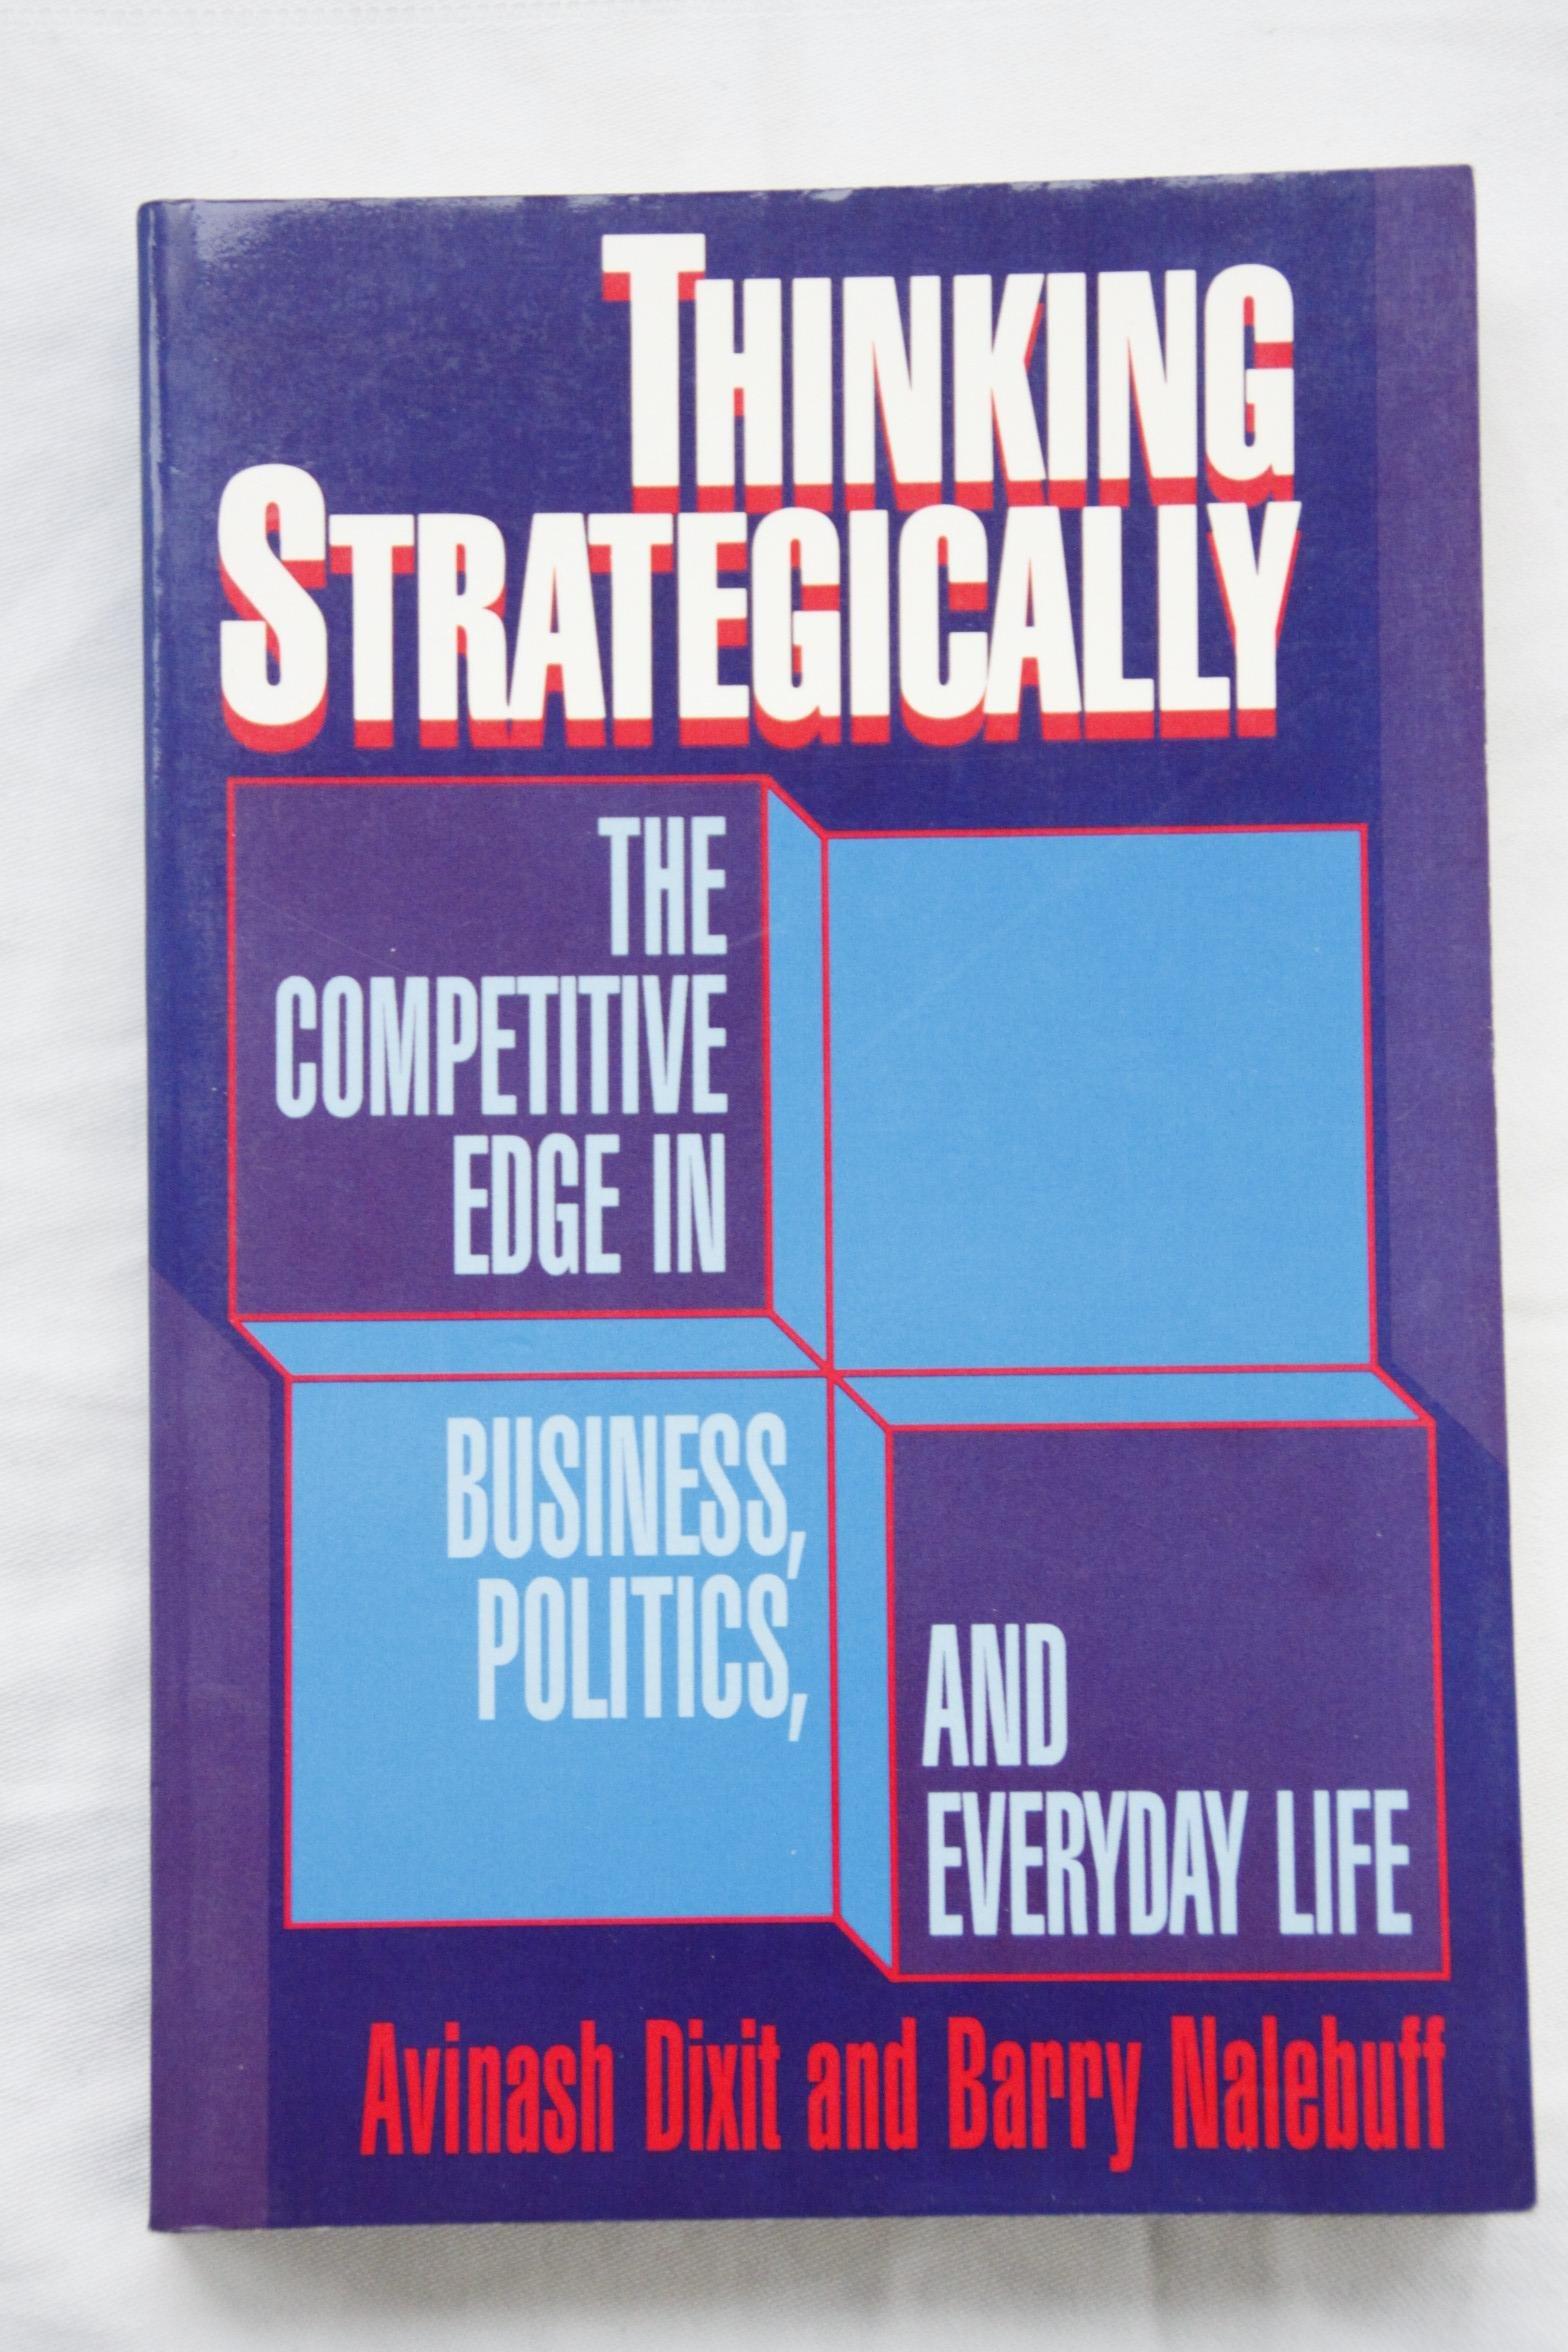 Thinking Strategically: Competitive Edge in Business, Politics and Everyday Life Norton professional series: Amazon.es: Avinash K. Dixit, Barry J. Nalebuff: Libros en idiomas extranjeros